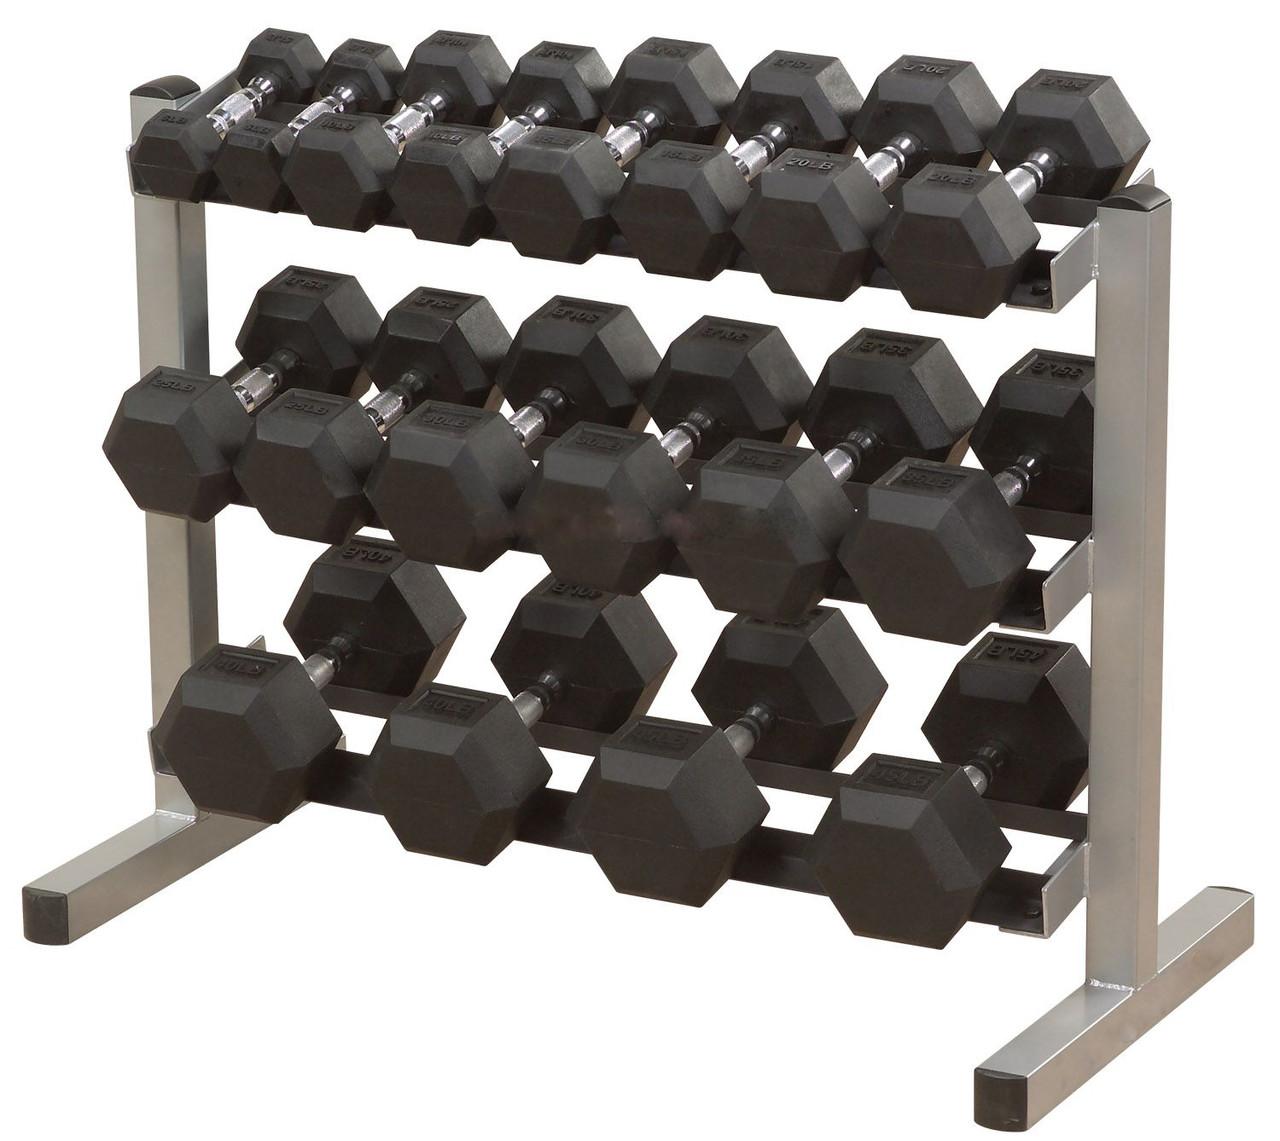 Ряд неразборных обрезиненных гантелей 1-40 кг (22 пары, шаг 1-2,5 кг)